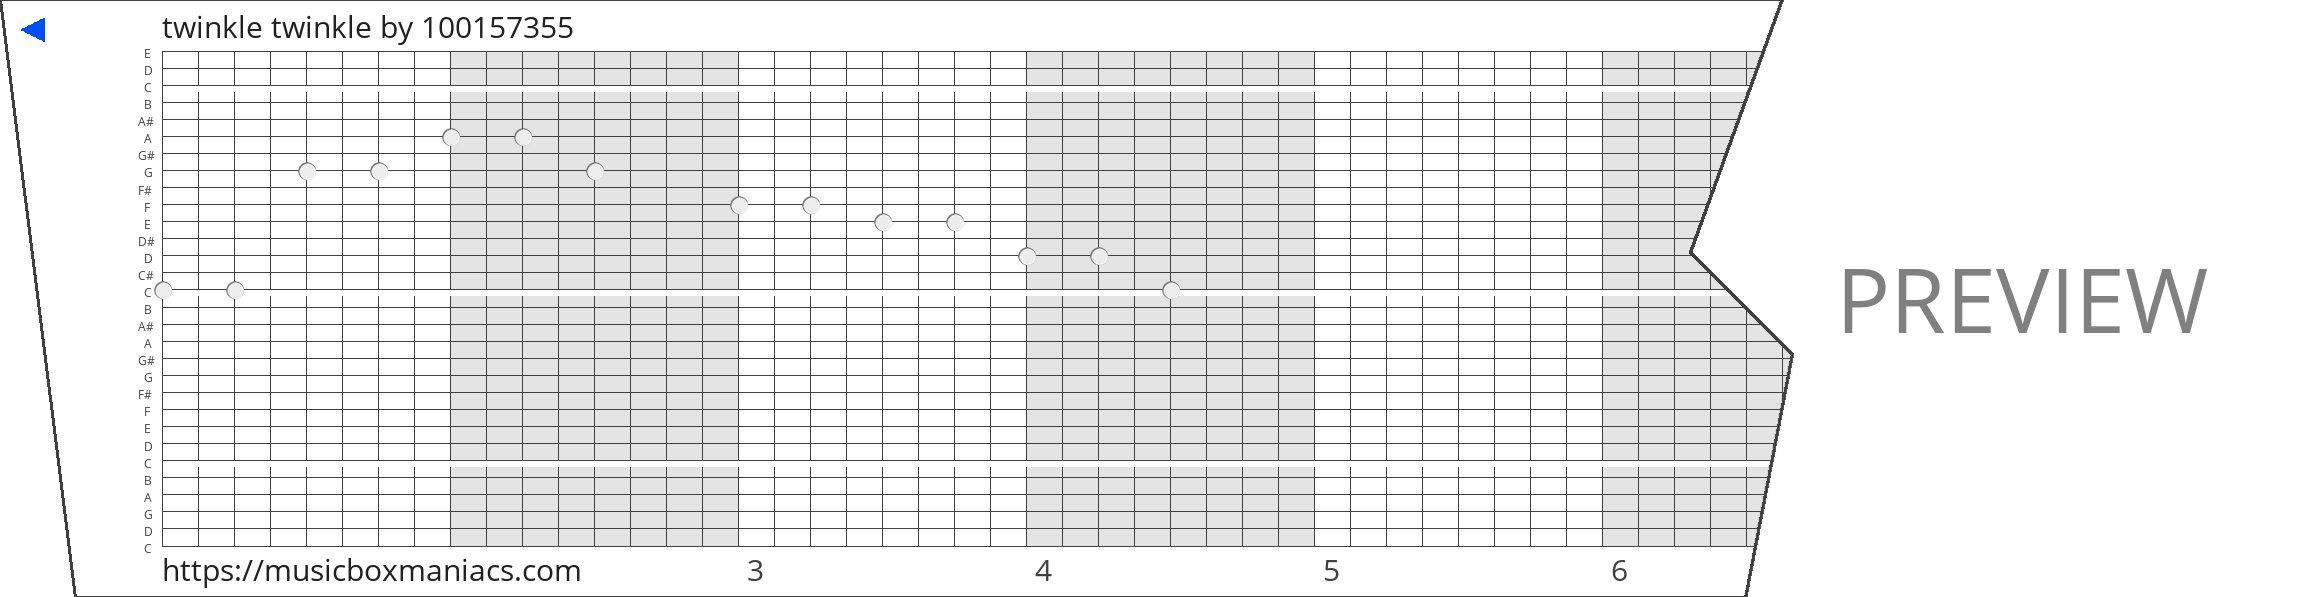 twinkle twinkle 30 note music box paper strip